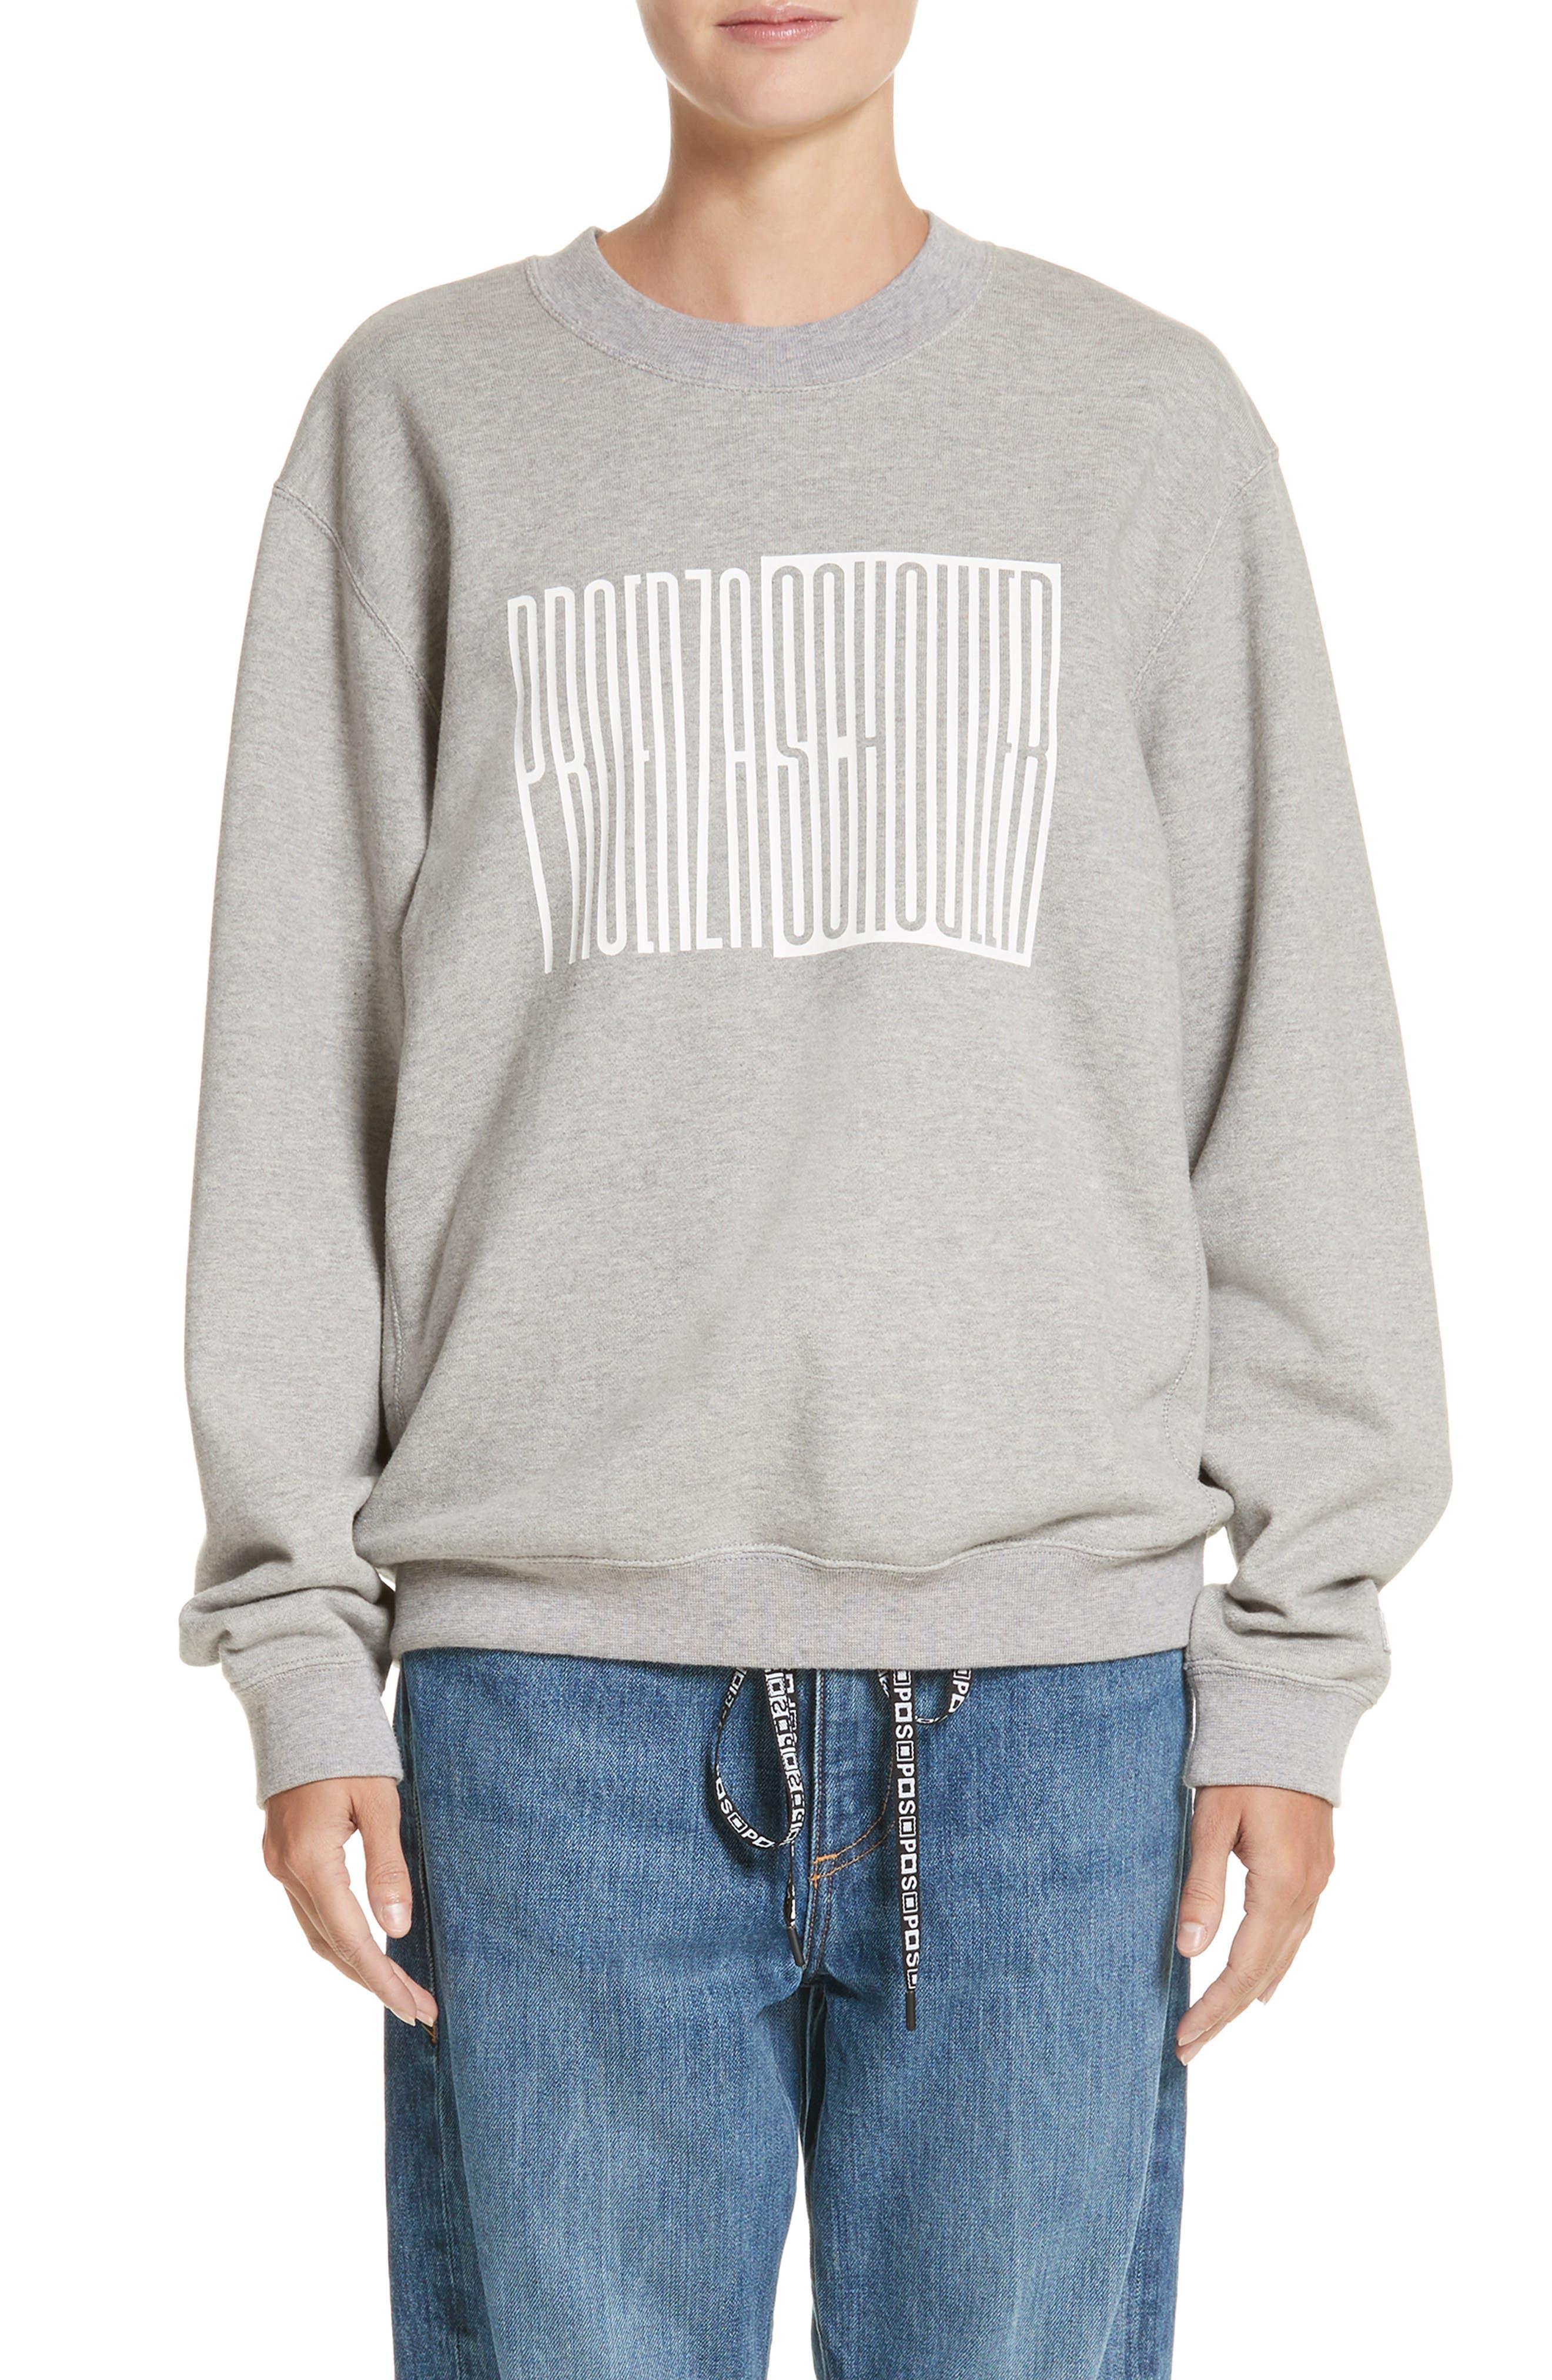 PSWL Graphic Jersey Oversize Sweatshirt,                         Main,                         color, Grey Melange/ White Logo